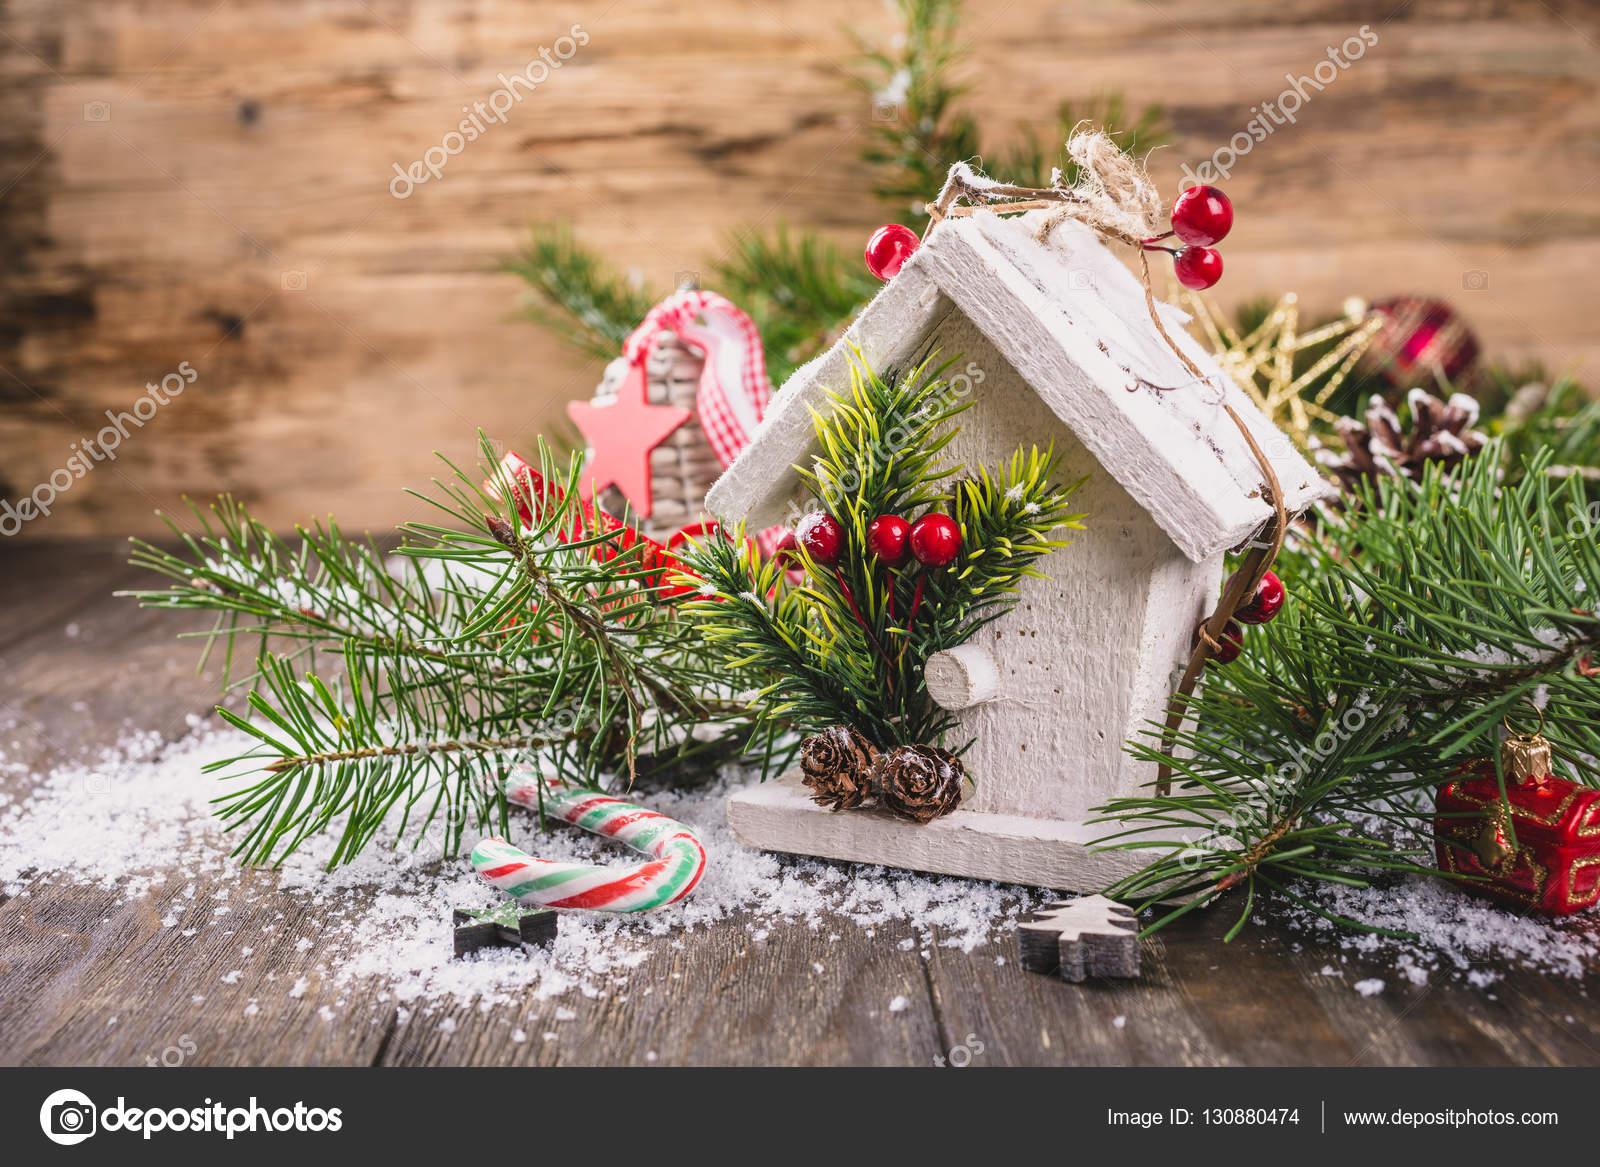 Witte Kerst Huis : Kerst samenstelling met witte houten huis u stockfoto imelnyk